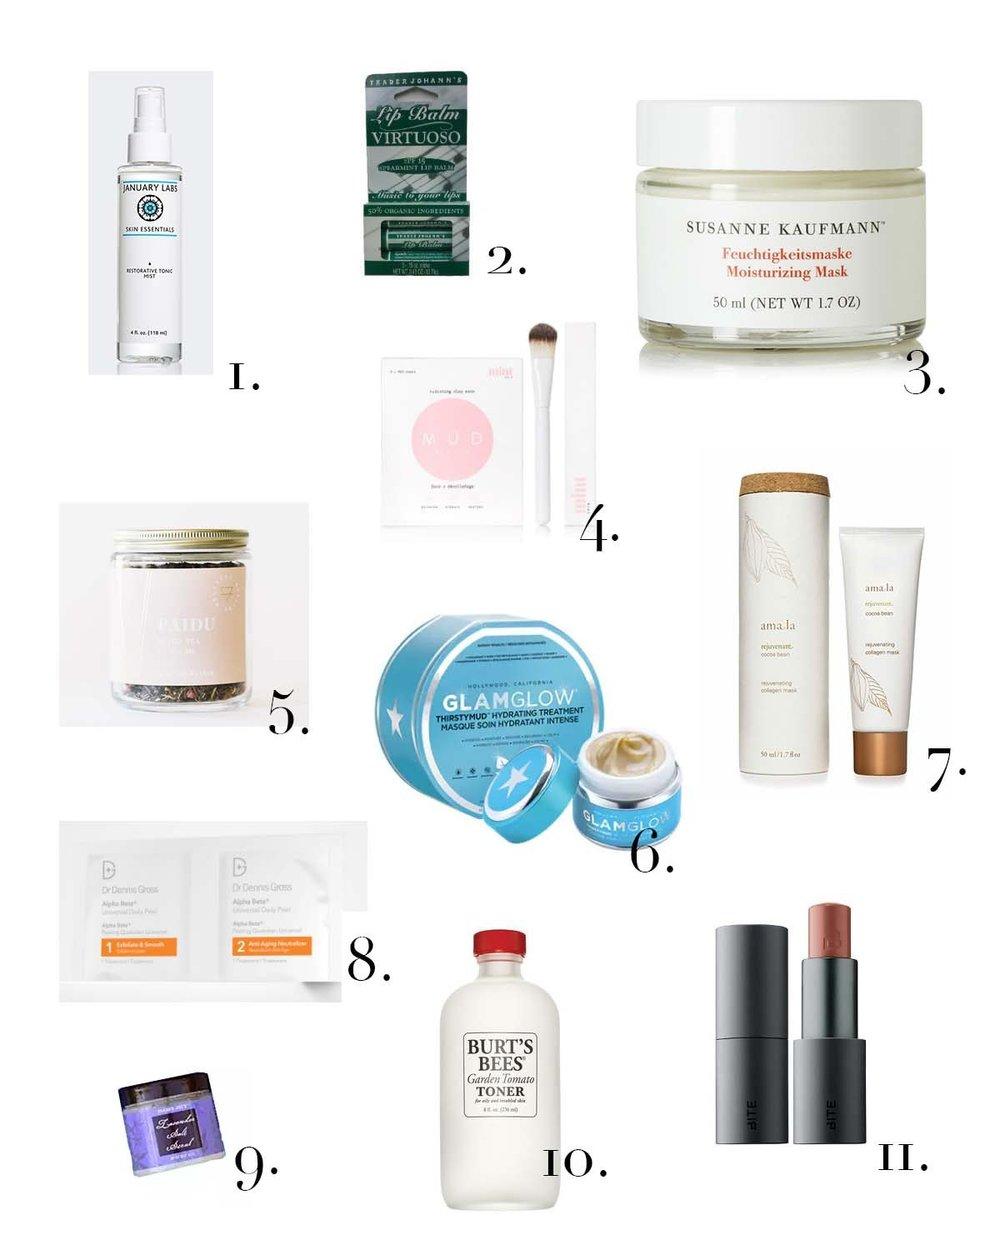 favorite-products-for-summer-loving-skin-darling.jpg